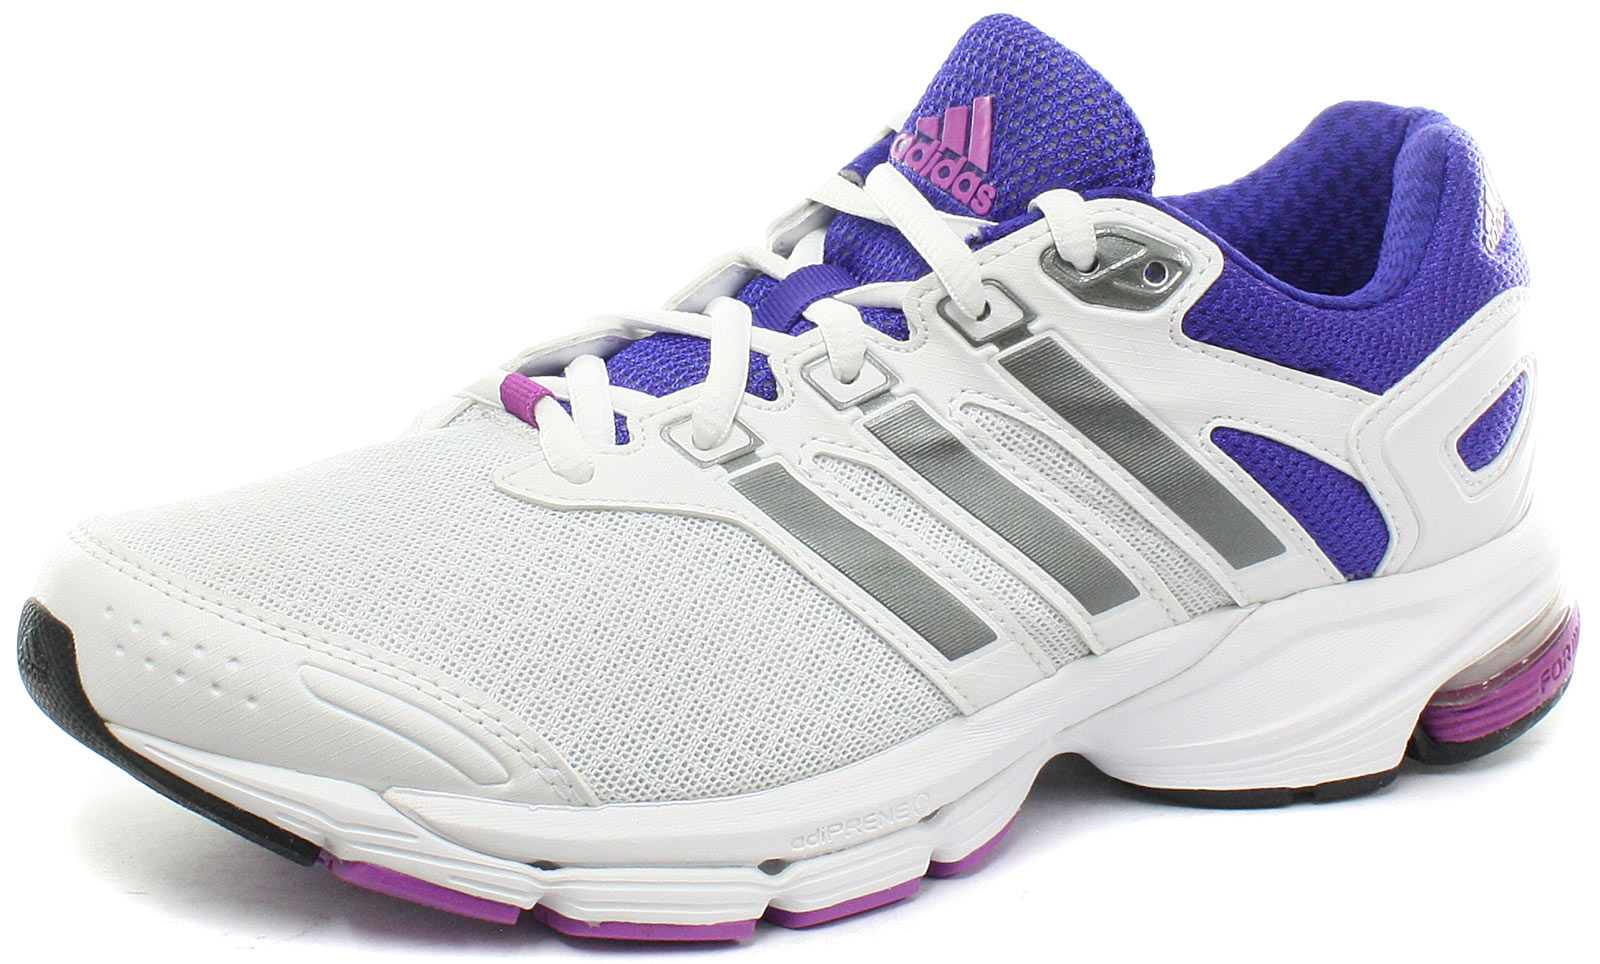 Adidas Lightster Coussin 2 Femme Chaussures De Course/Baskets Taille UK 9 (EU 43 1/3)-